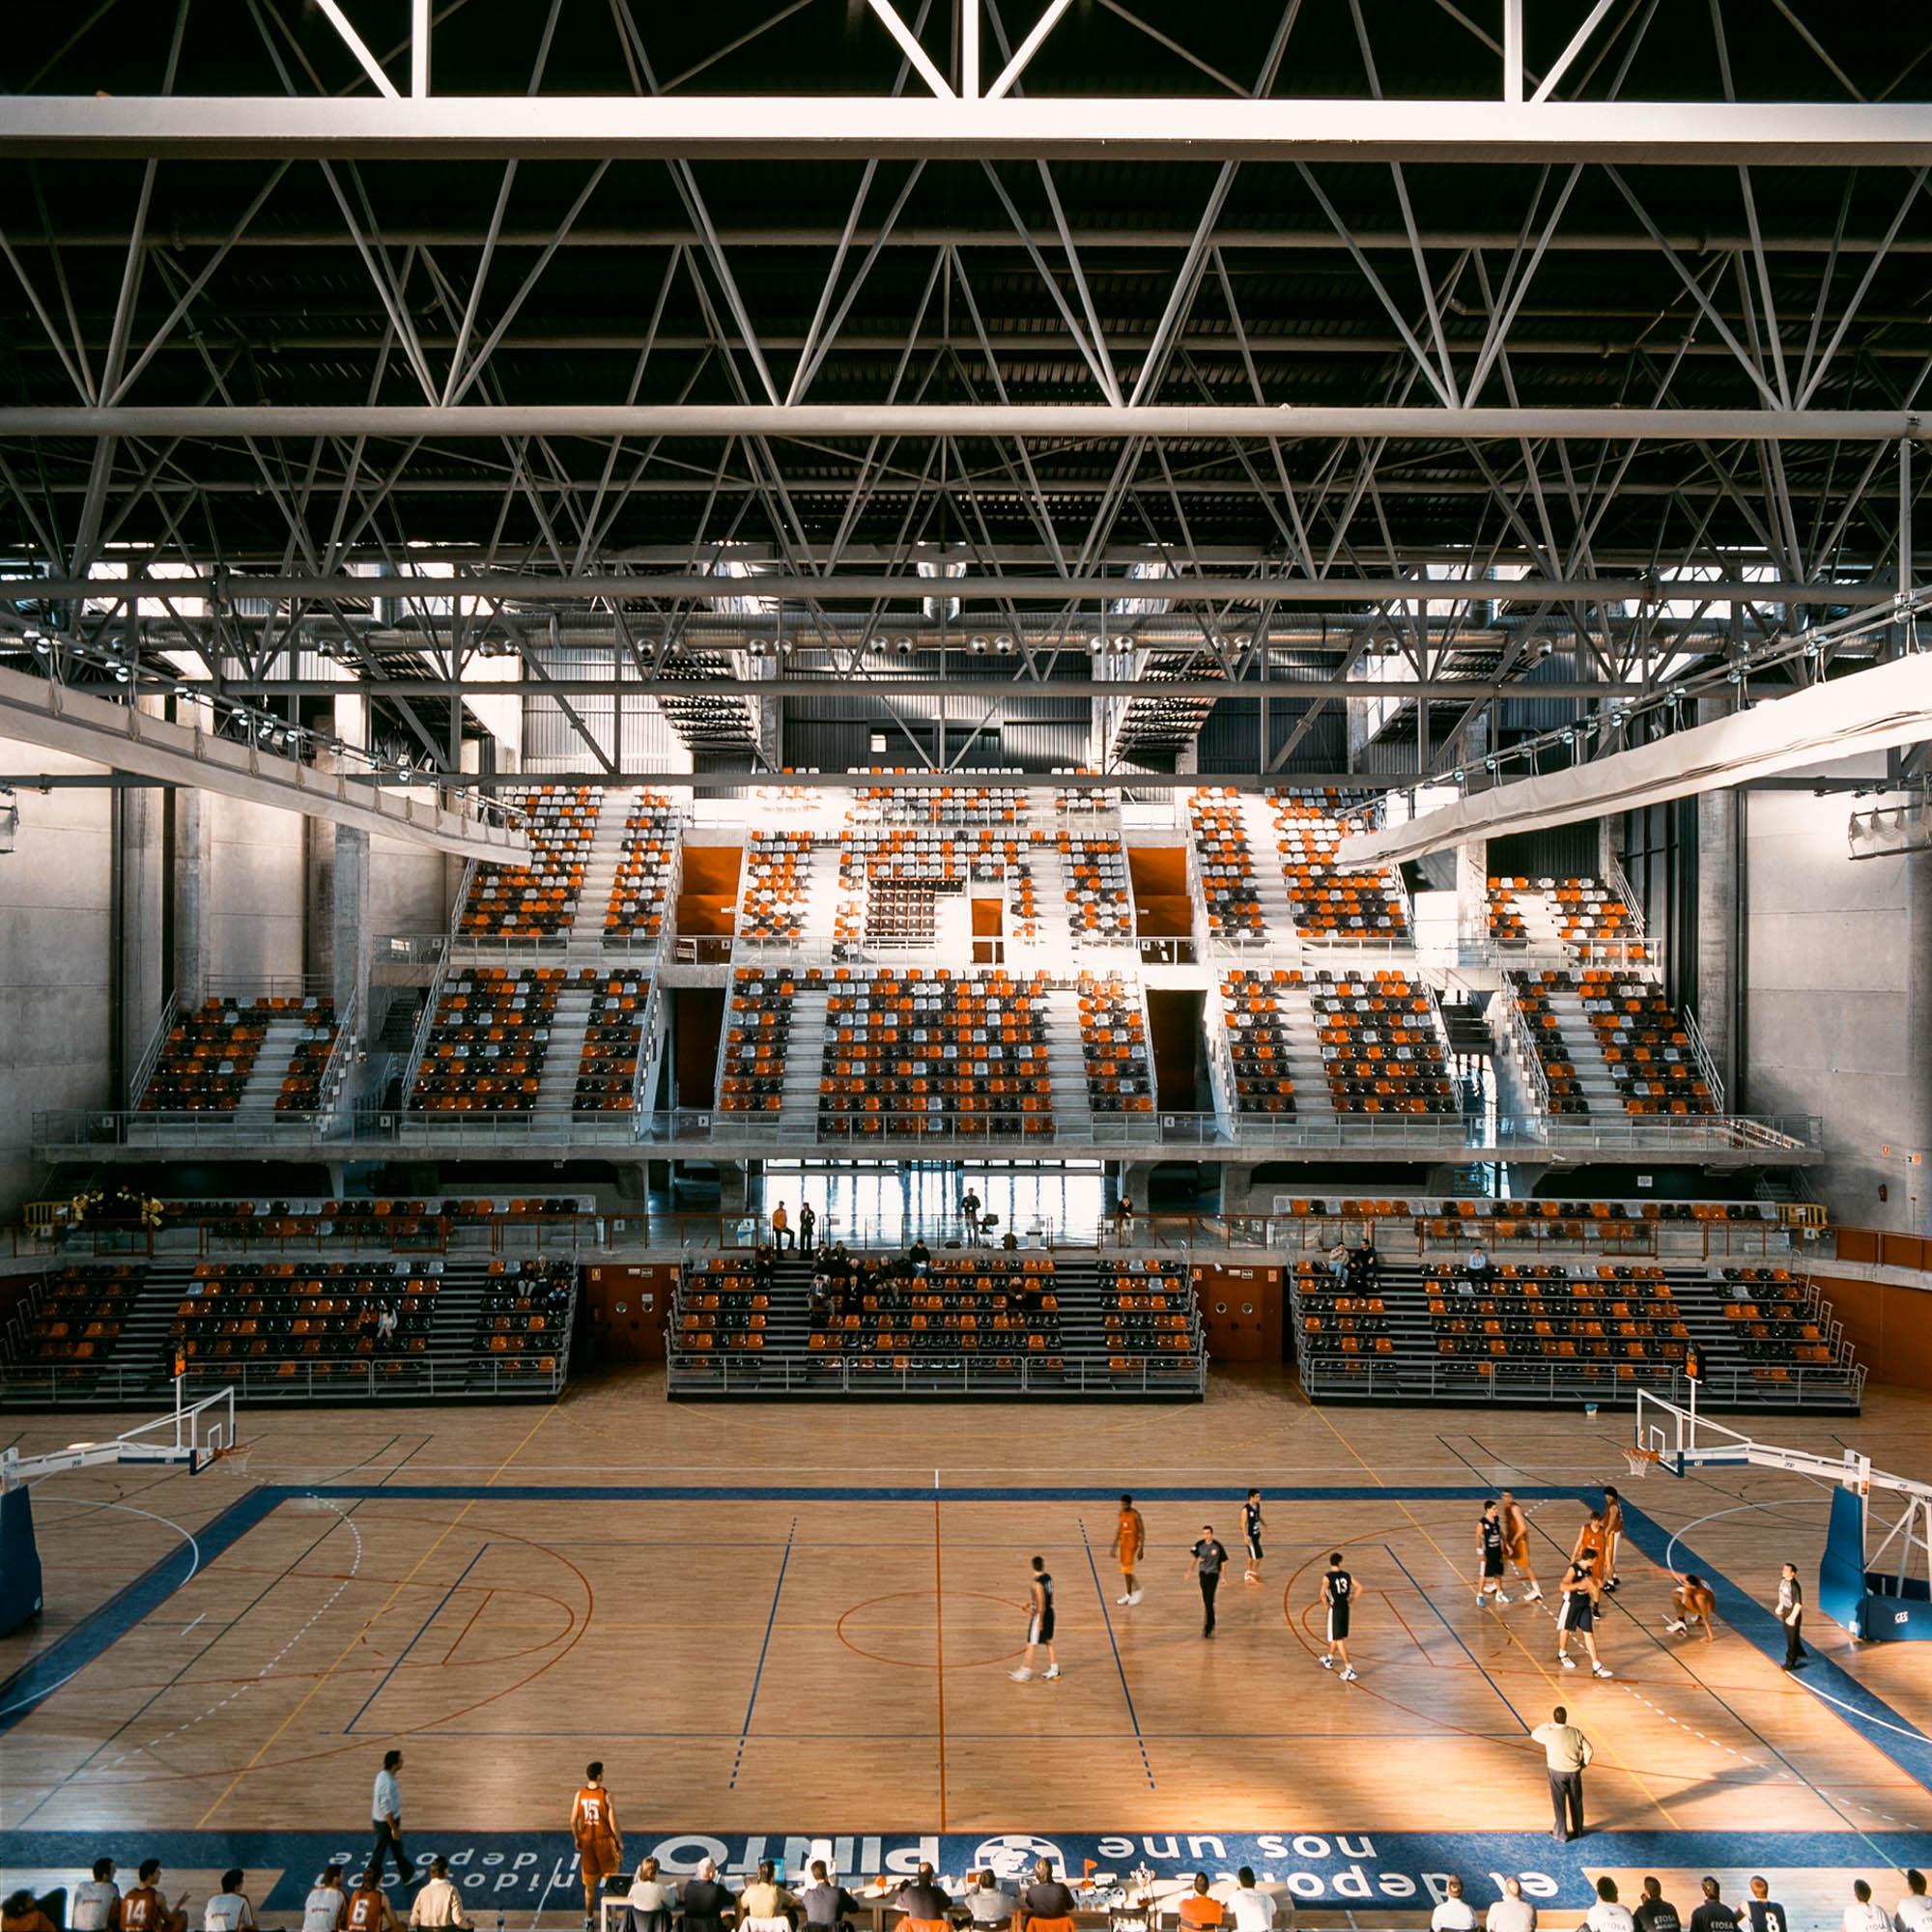 Polideportivo Munucipal Príncipes de Asturias en Pinto